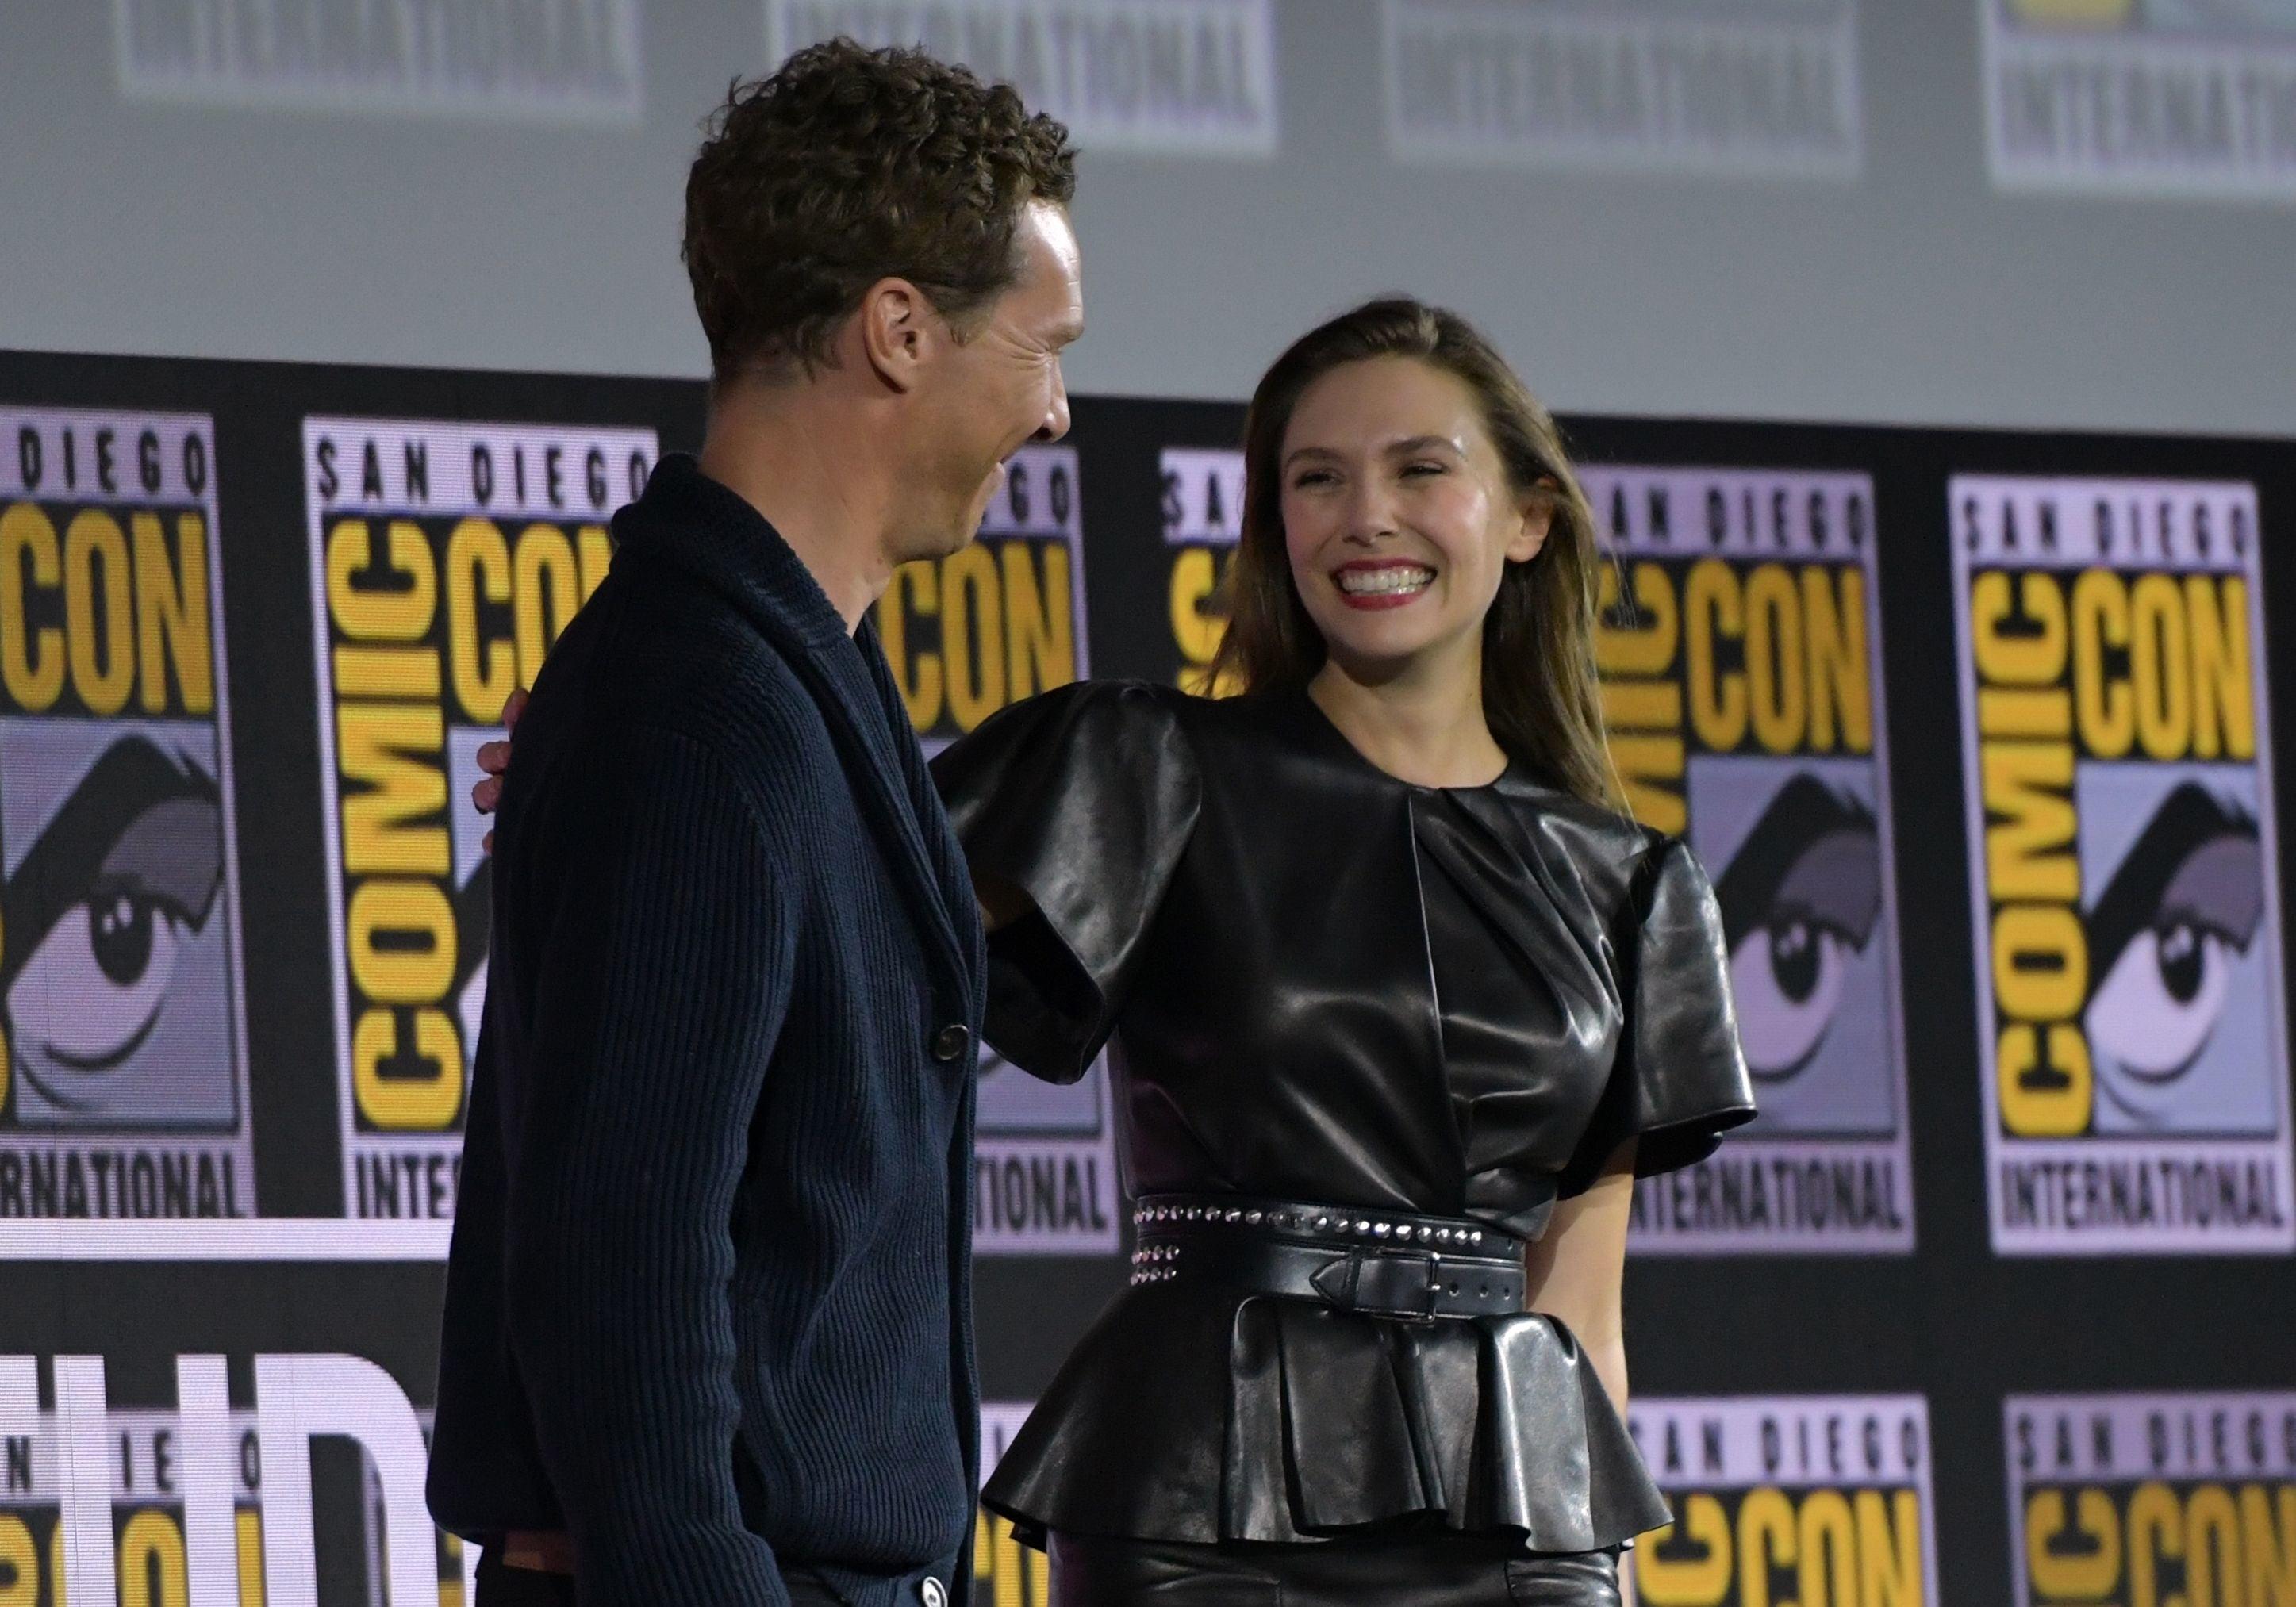 Elizabeth Olsen smiling at Benedict Cumberbatch, who plays Dr. Strange, at a ComicCon panel